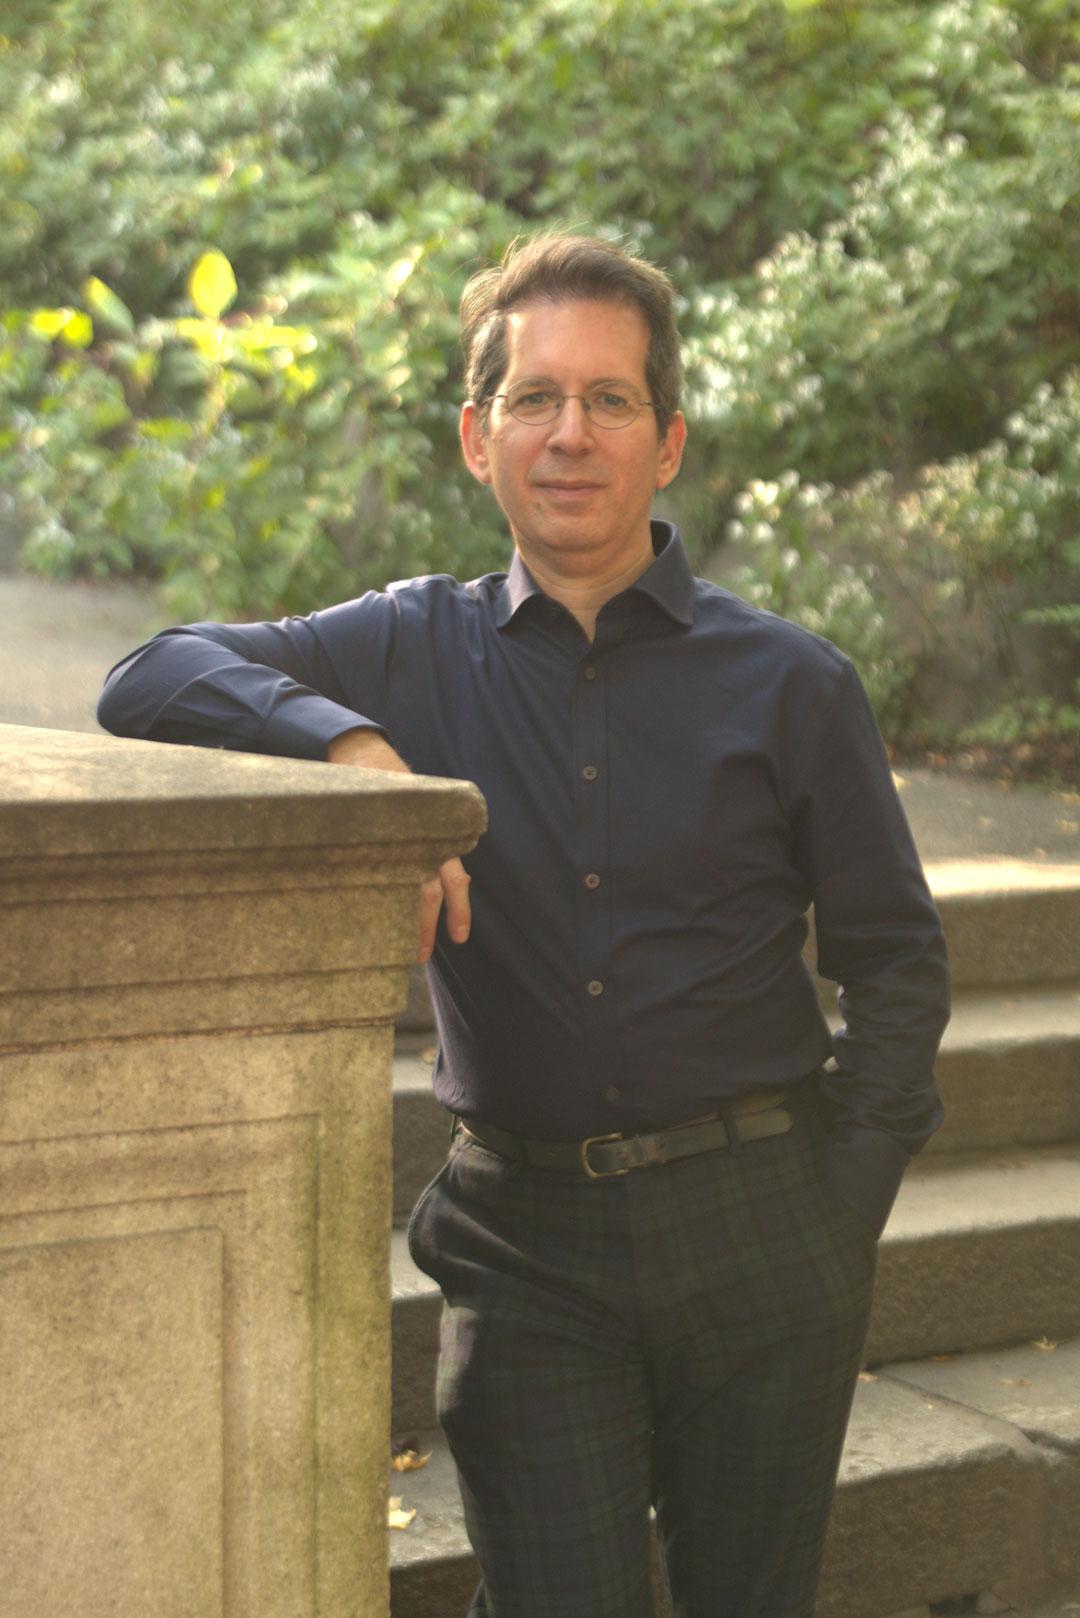 Charles Basman